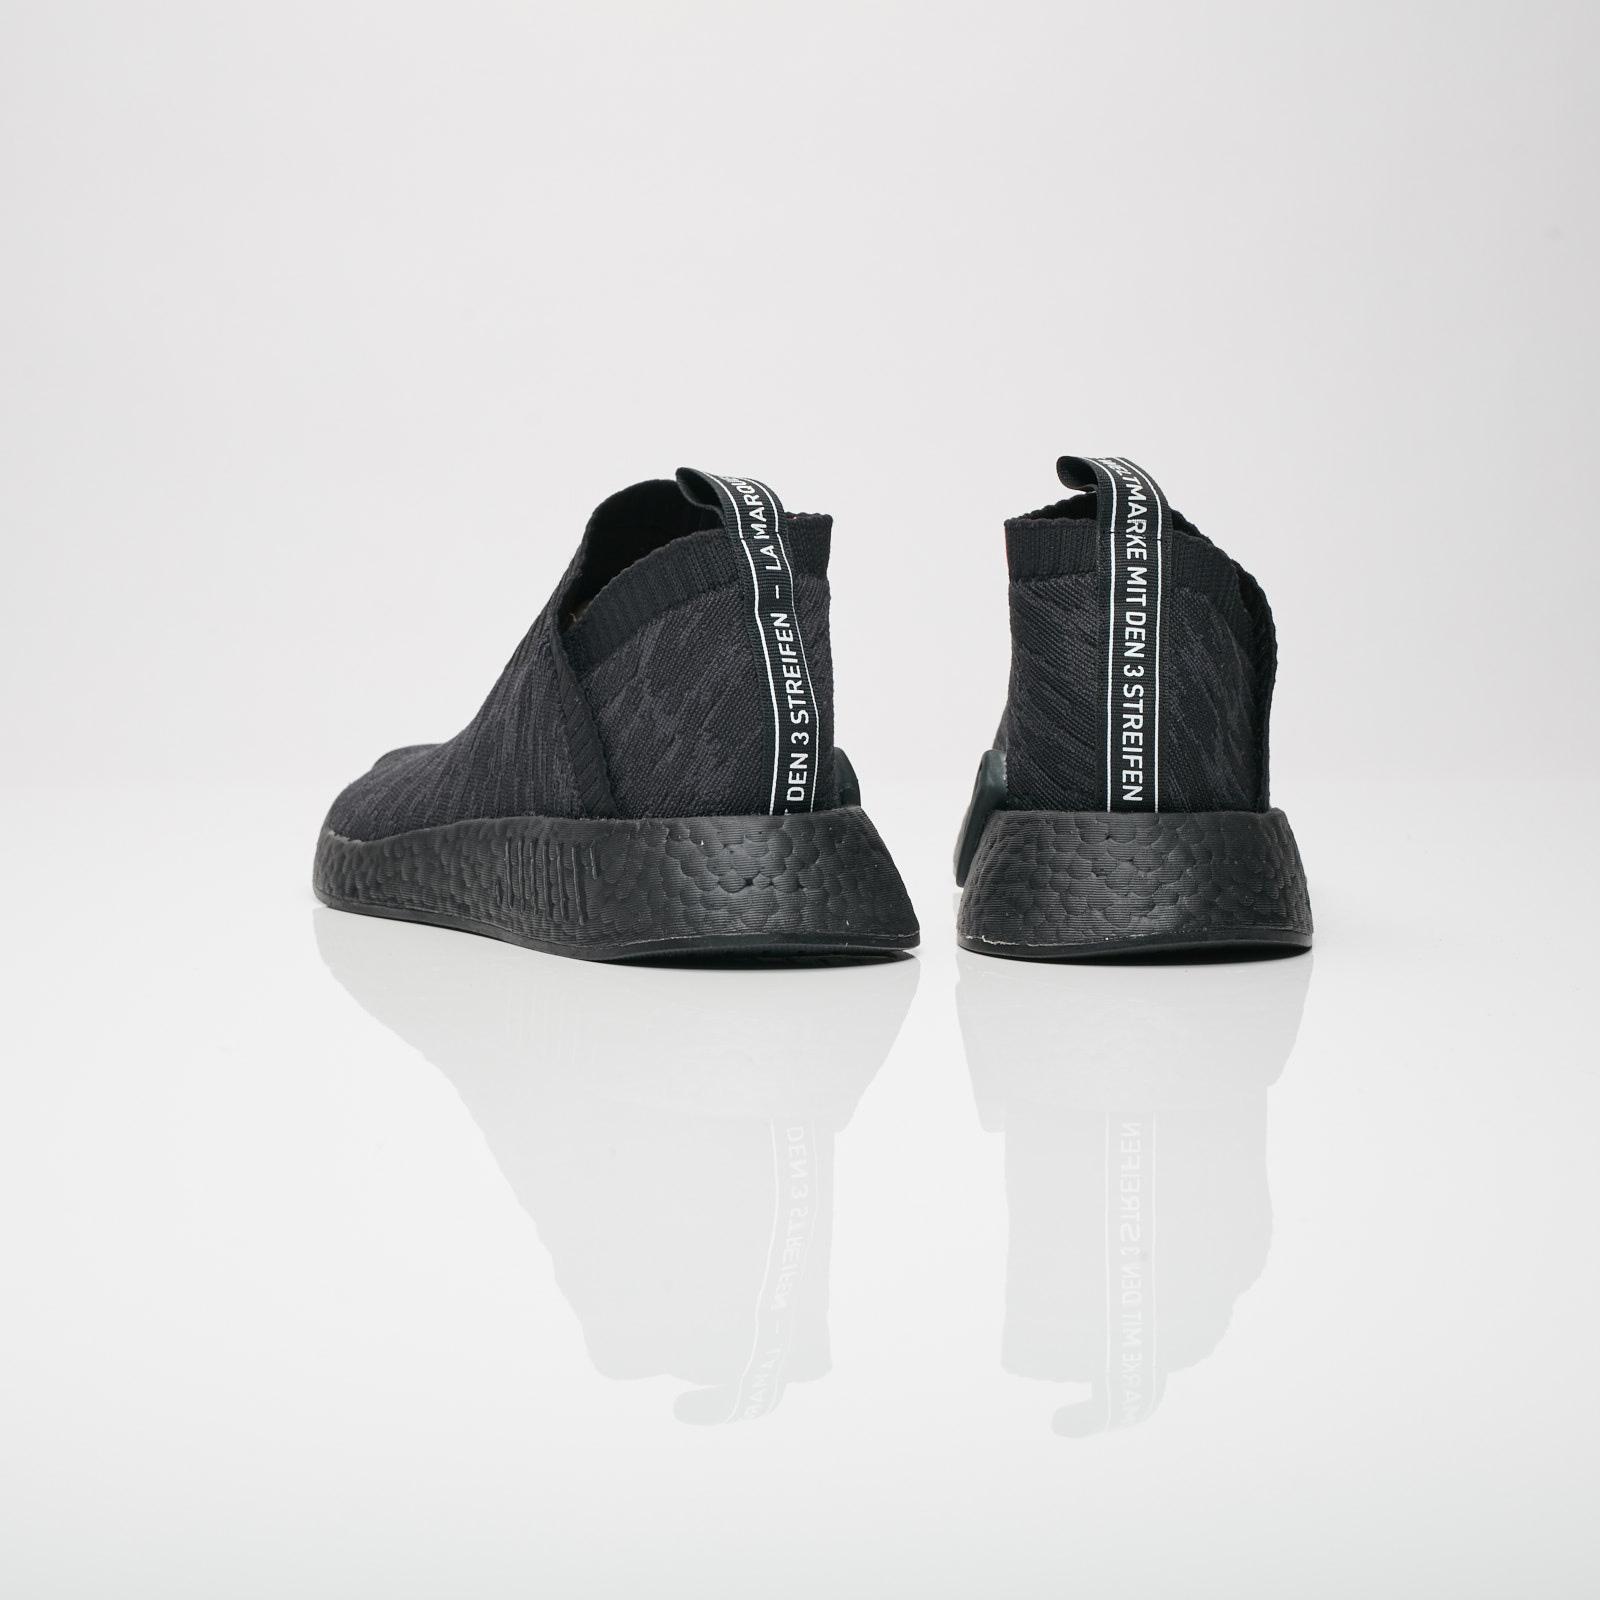 7b86e8249 adidas NMD CS2 PK - Cq2373 - Sneakersnstuff